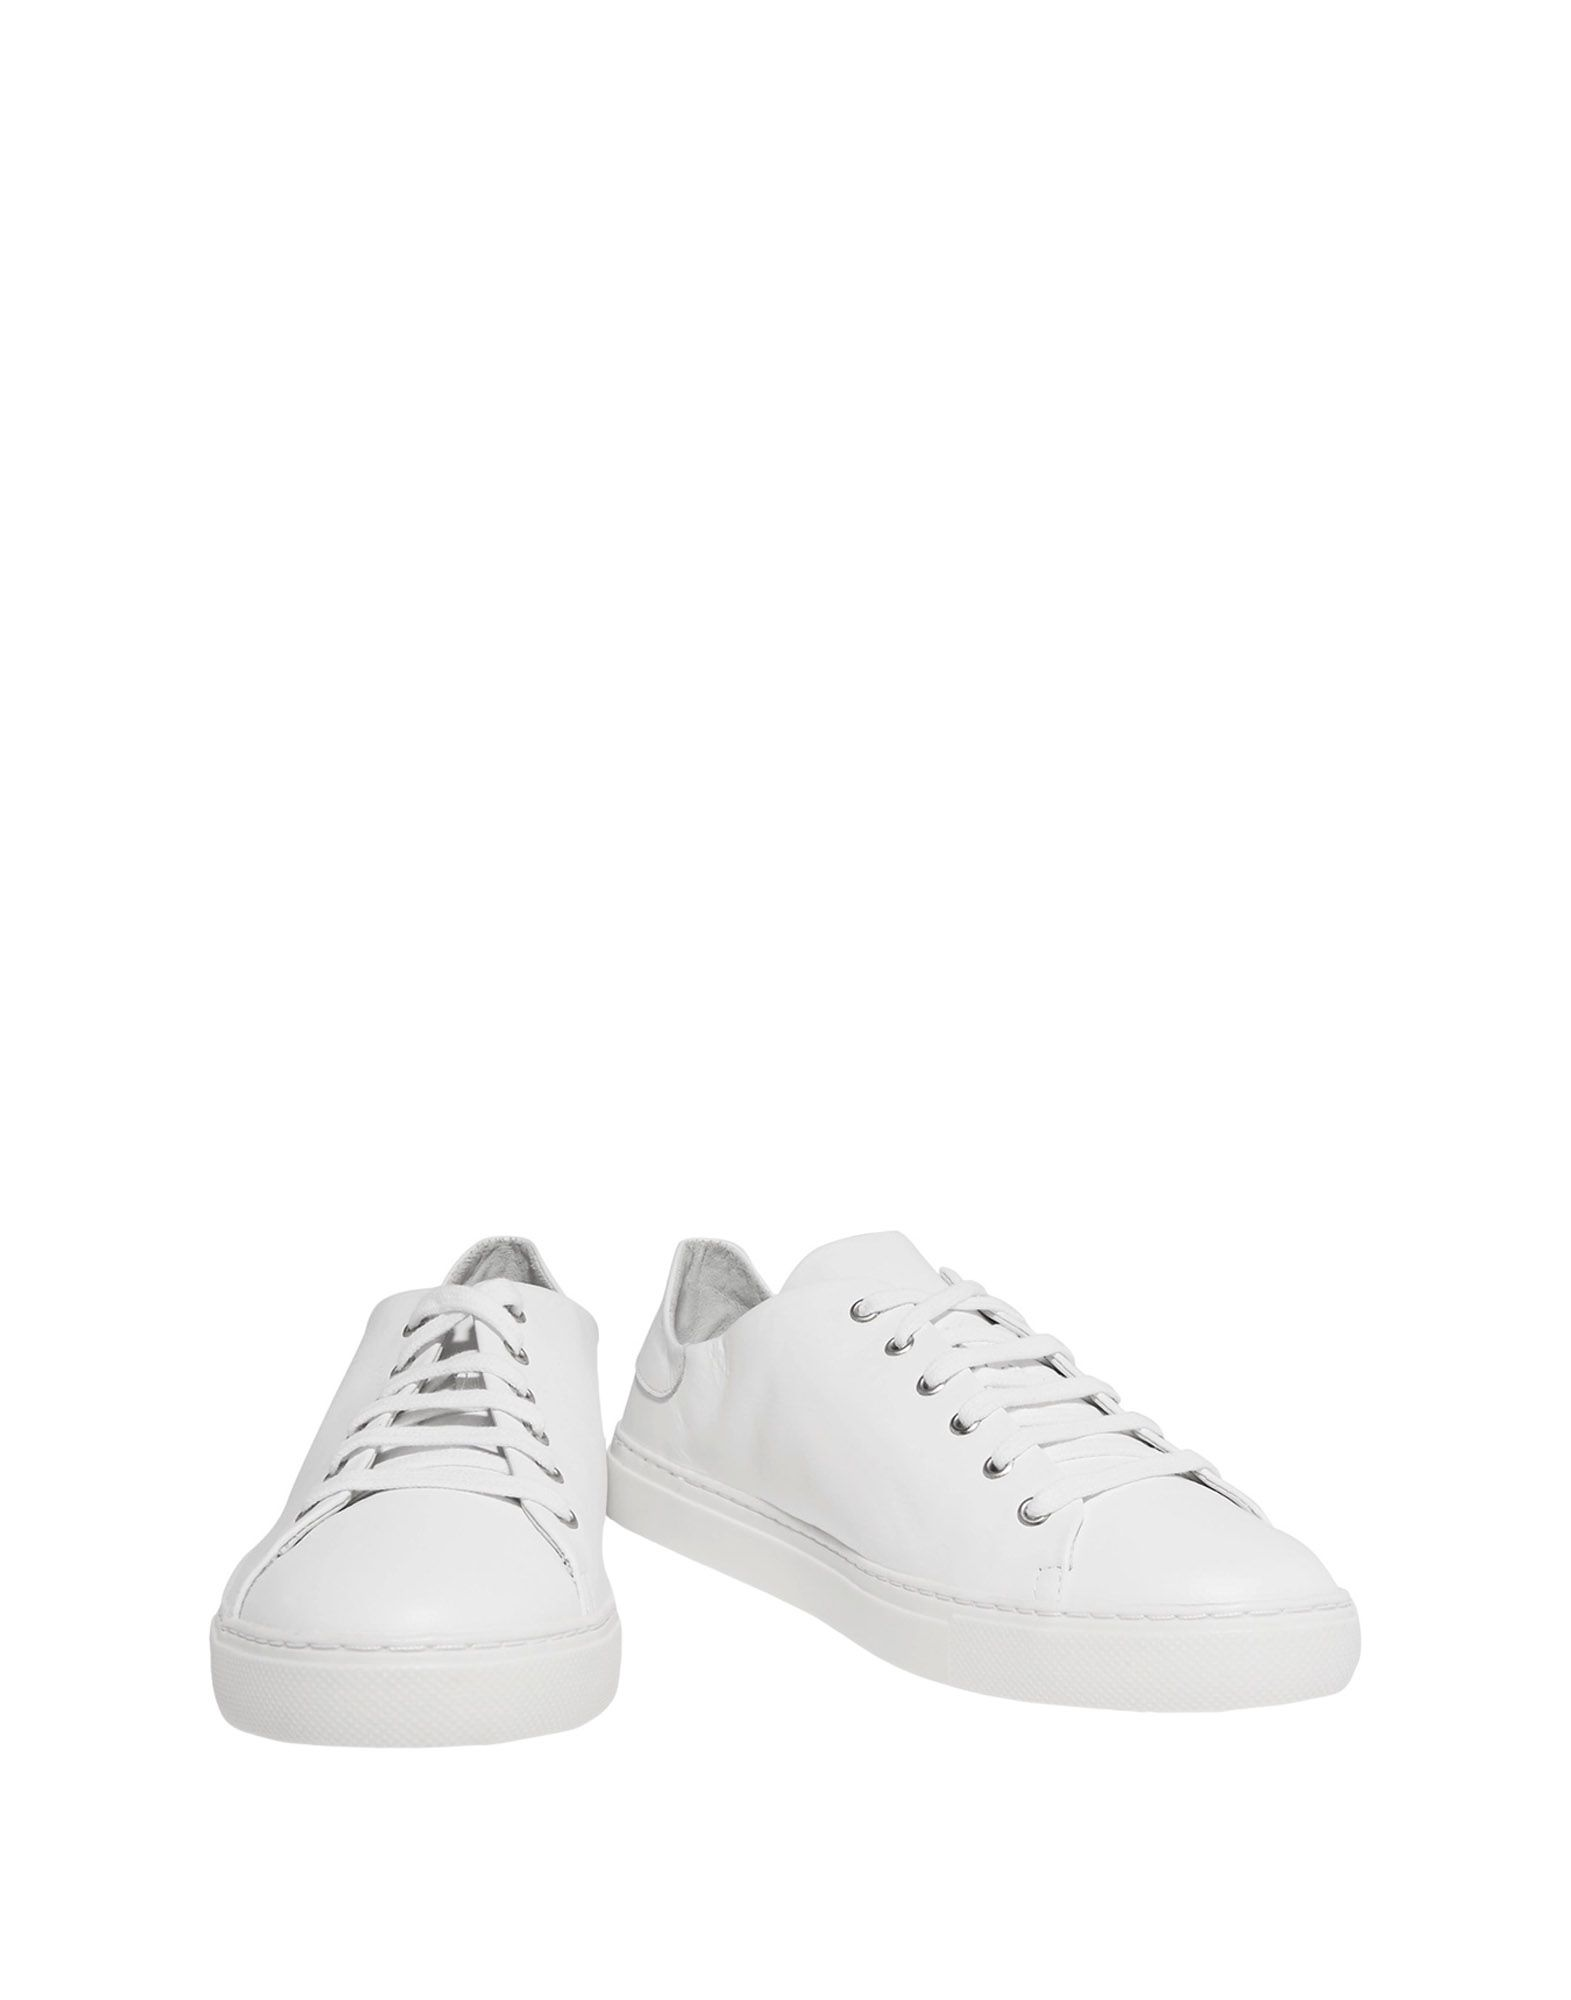 Sneakers Schutz Donna - 11513951NI elegante